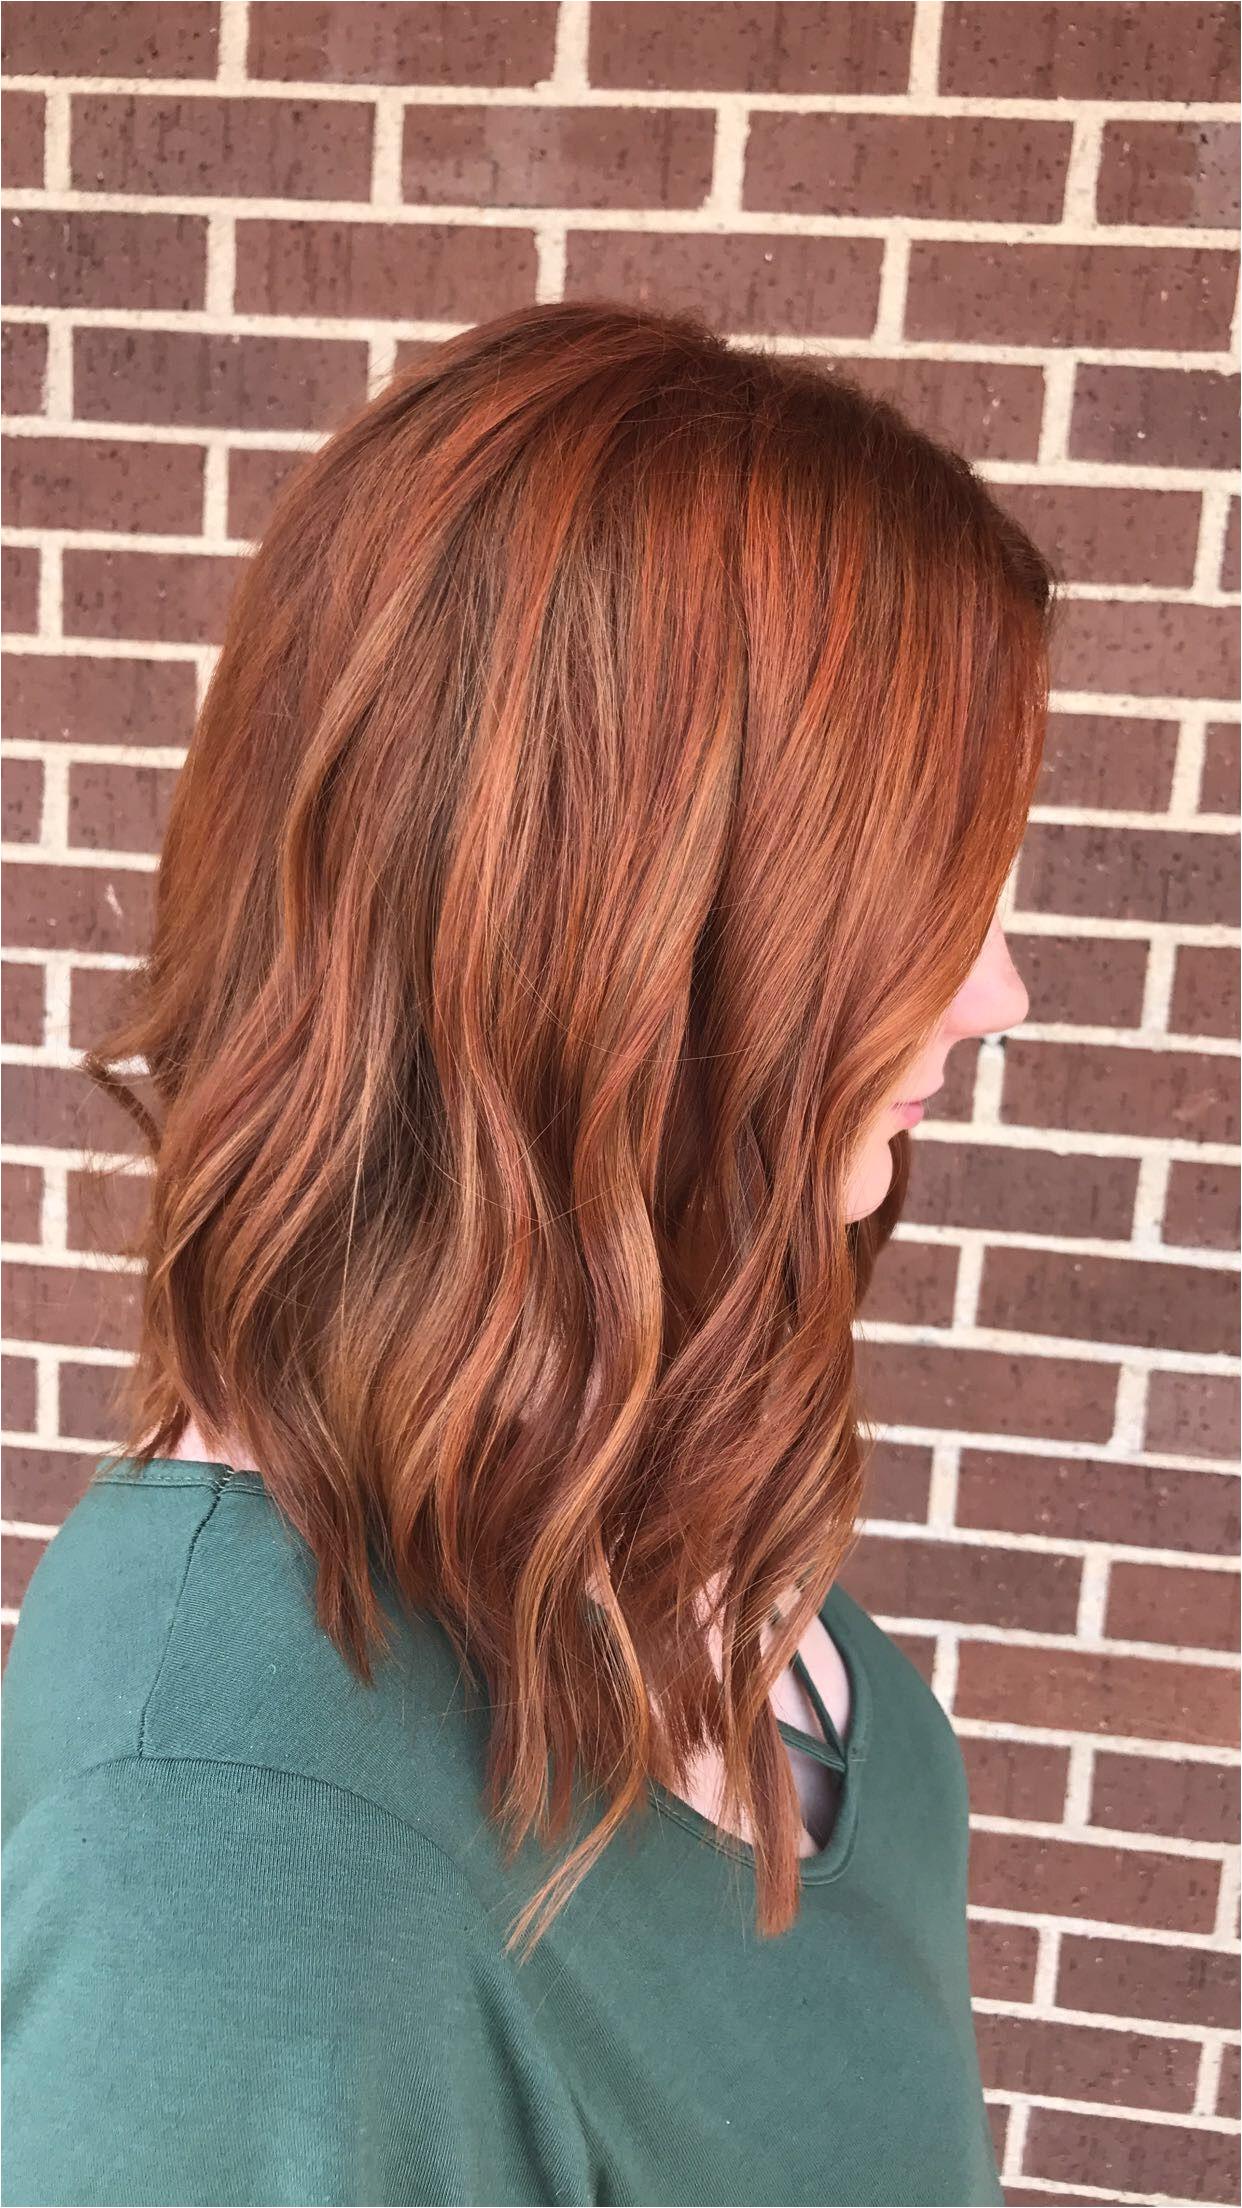 Cooper red hair Long bob cut